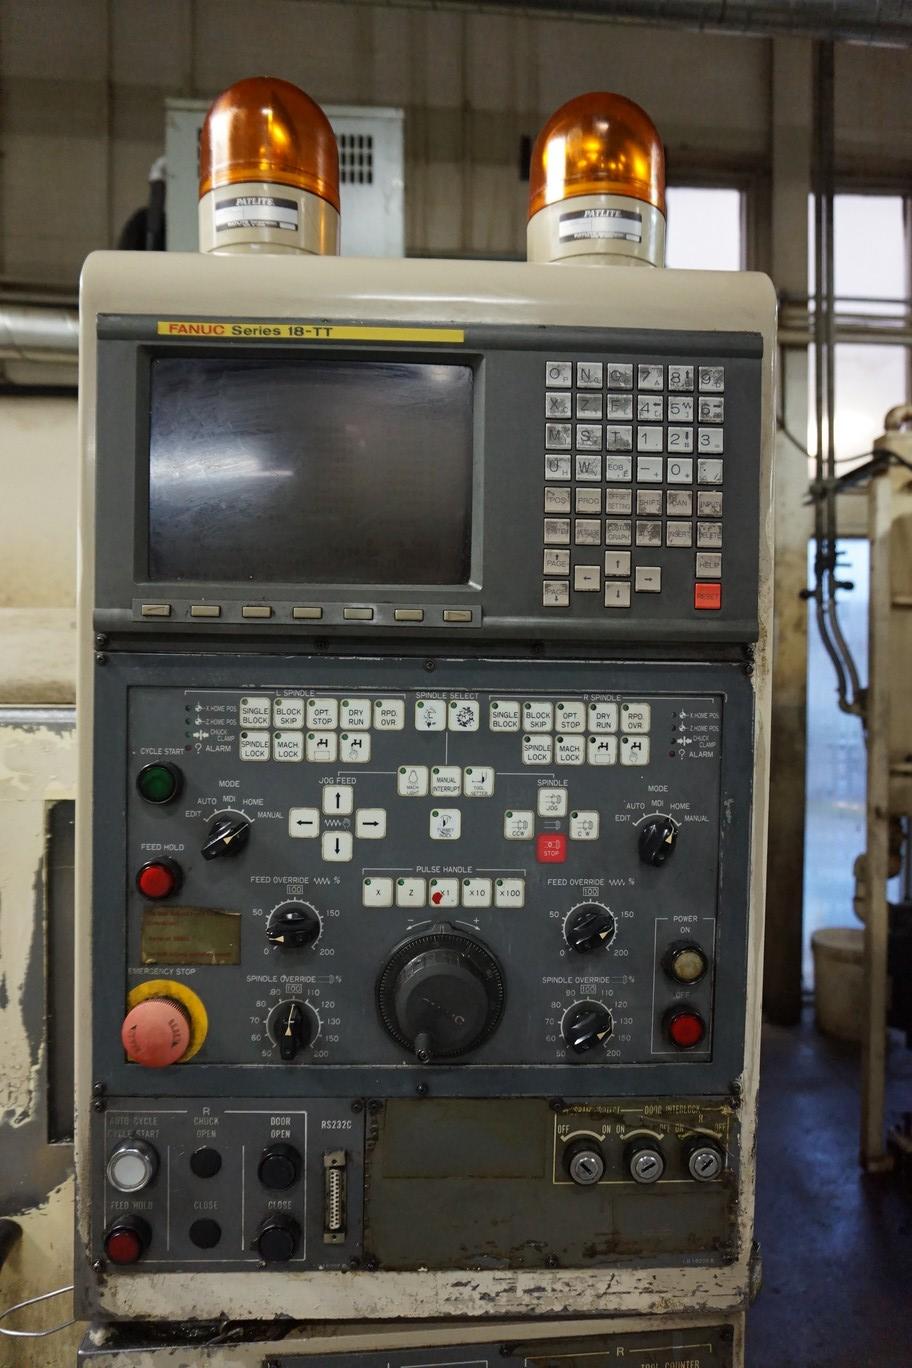 Okuma-Howa Model 2SP-20H CNC Lathe, c/w Fanuc Series 18-TT Controller, Chip Conveyor, Transformer - Image 2 of 7